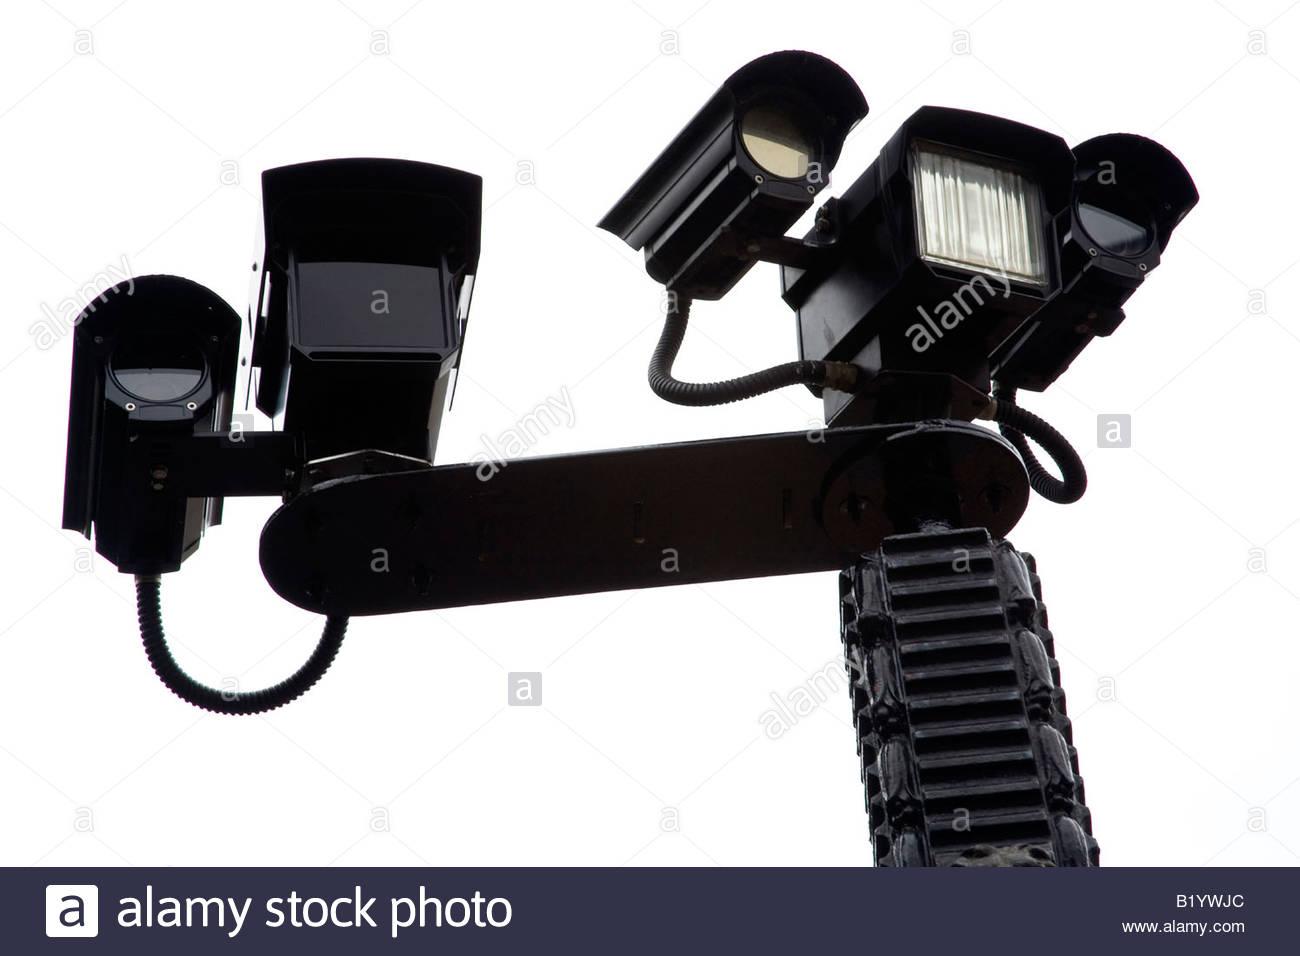 CCTV Cameras, Urban Street Details. - Stock Image